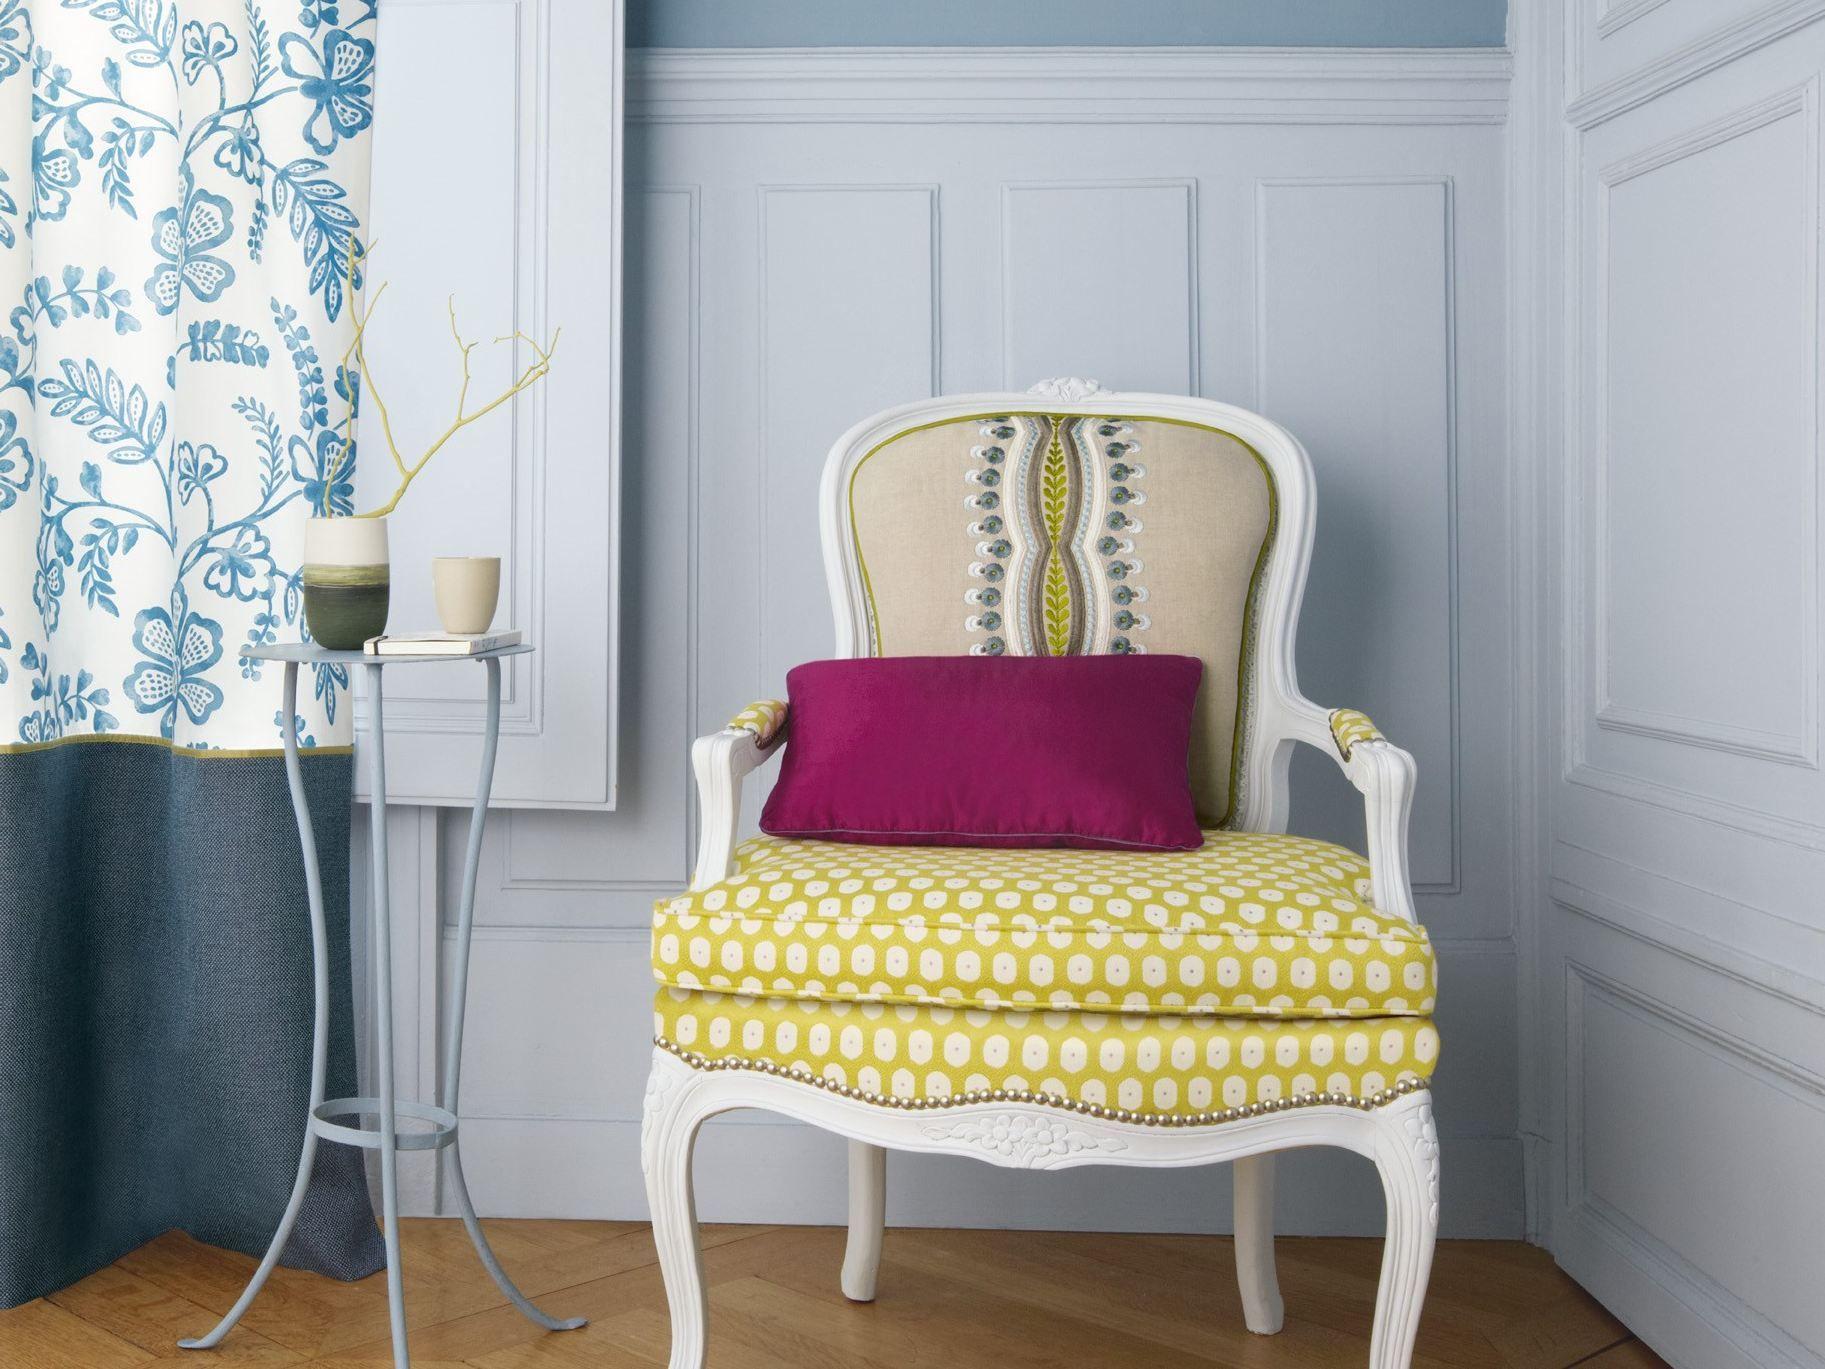 gavotte tissu d 39 ameublement by zimmer rohde. Black Bedroom Furniture Sets. Home Design Ideas